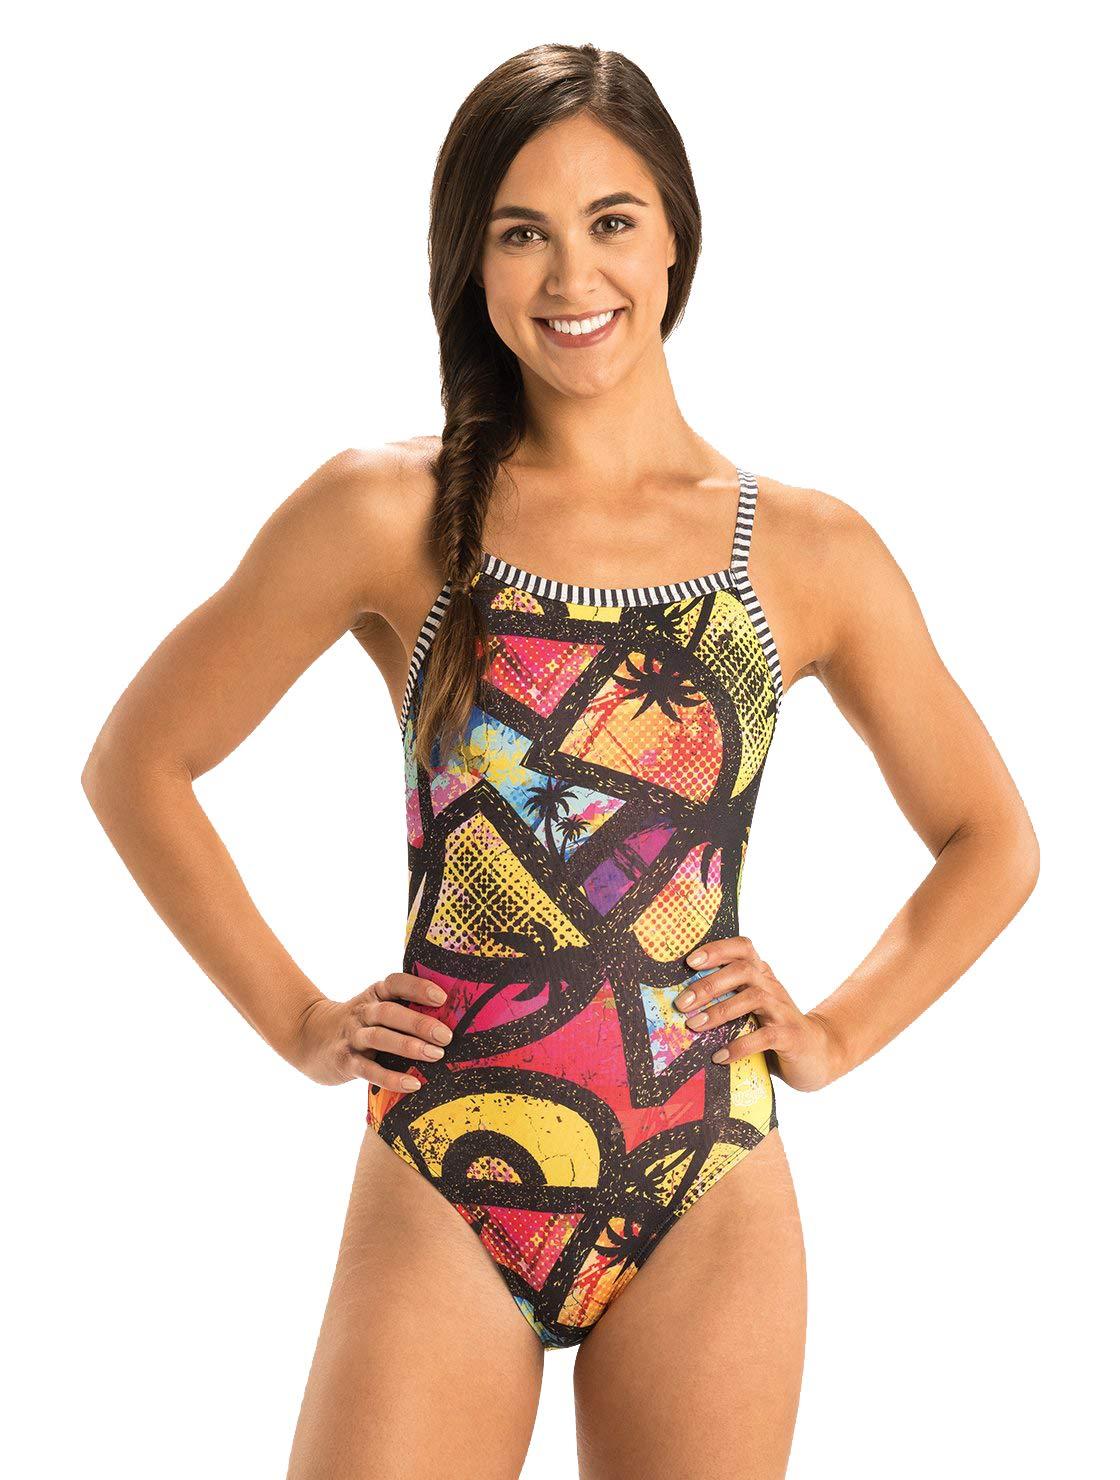 b398afa78c8 Amazon.com : Dolfin Women's Uglies String Back ONE-Piece SWIMSUIT-9501L :  Sports & Outdoors